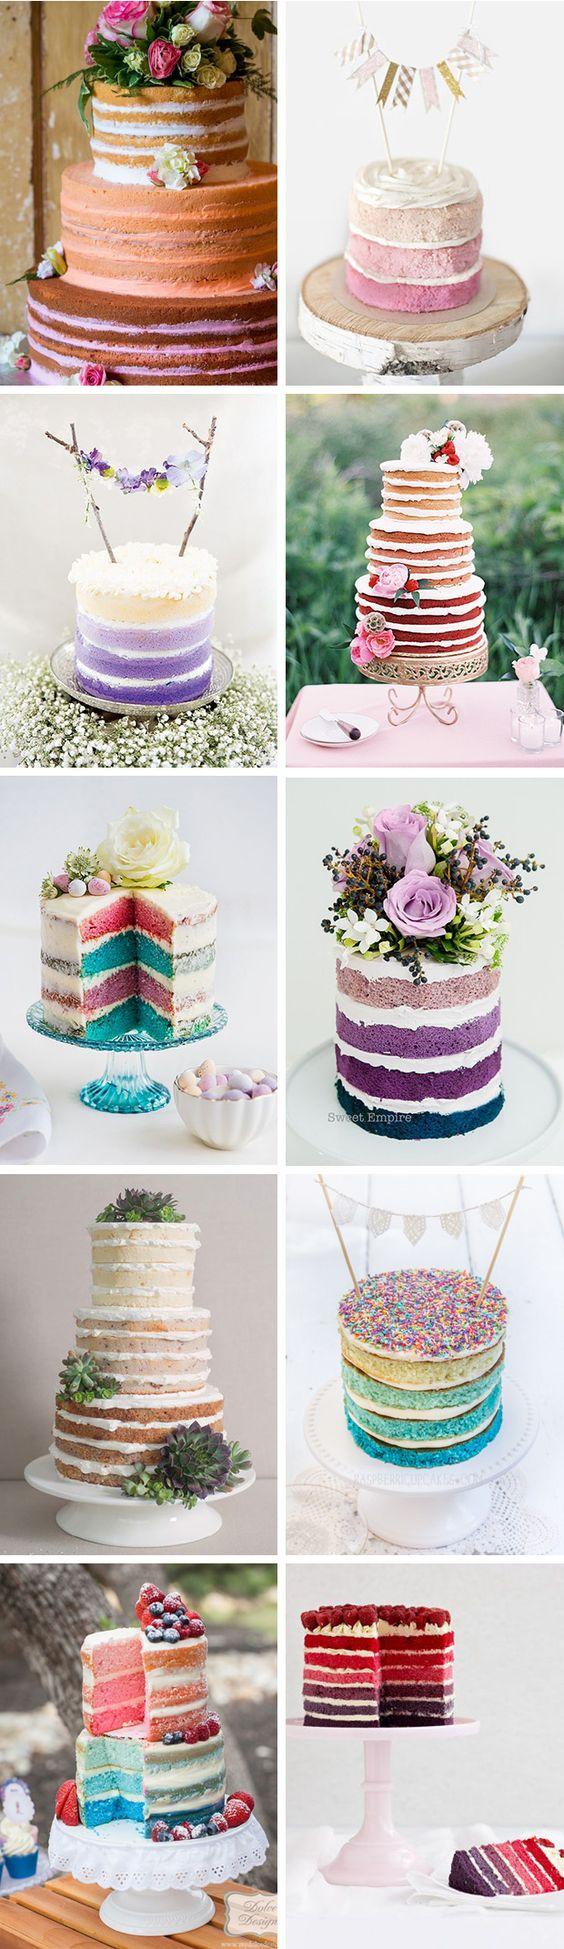 como hacer naked cake moderno 4